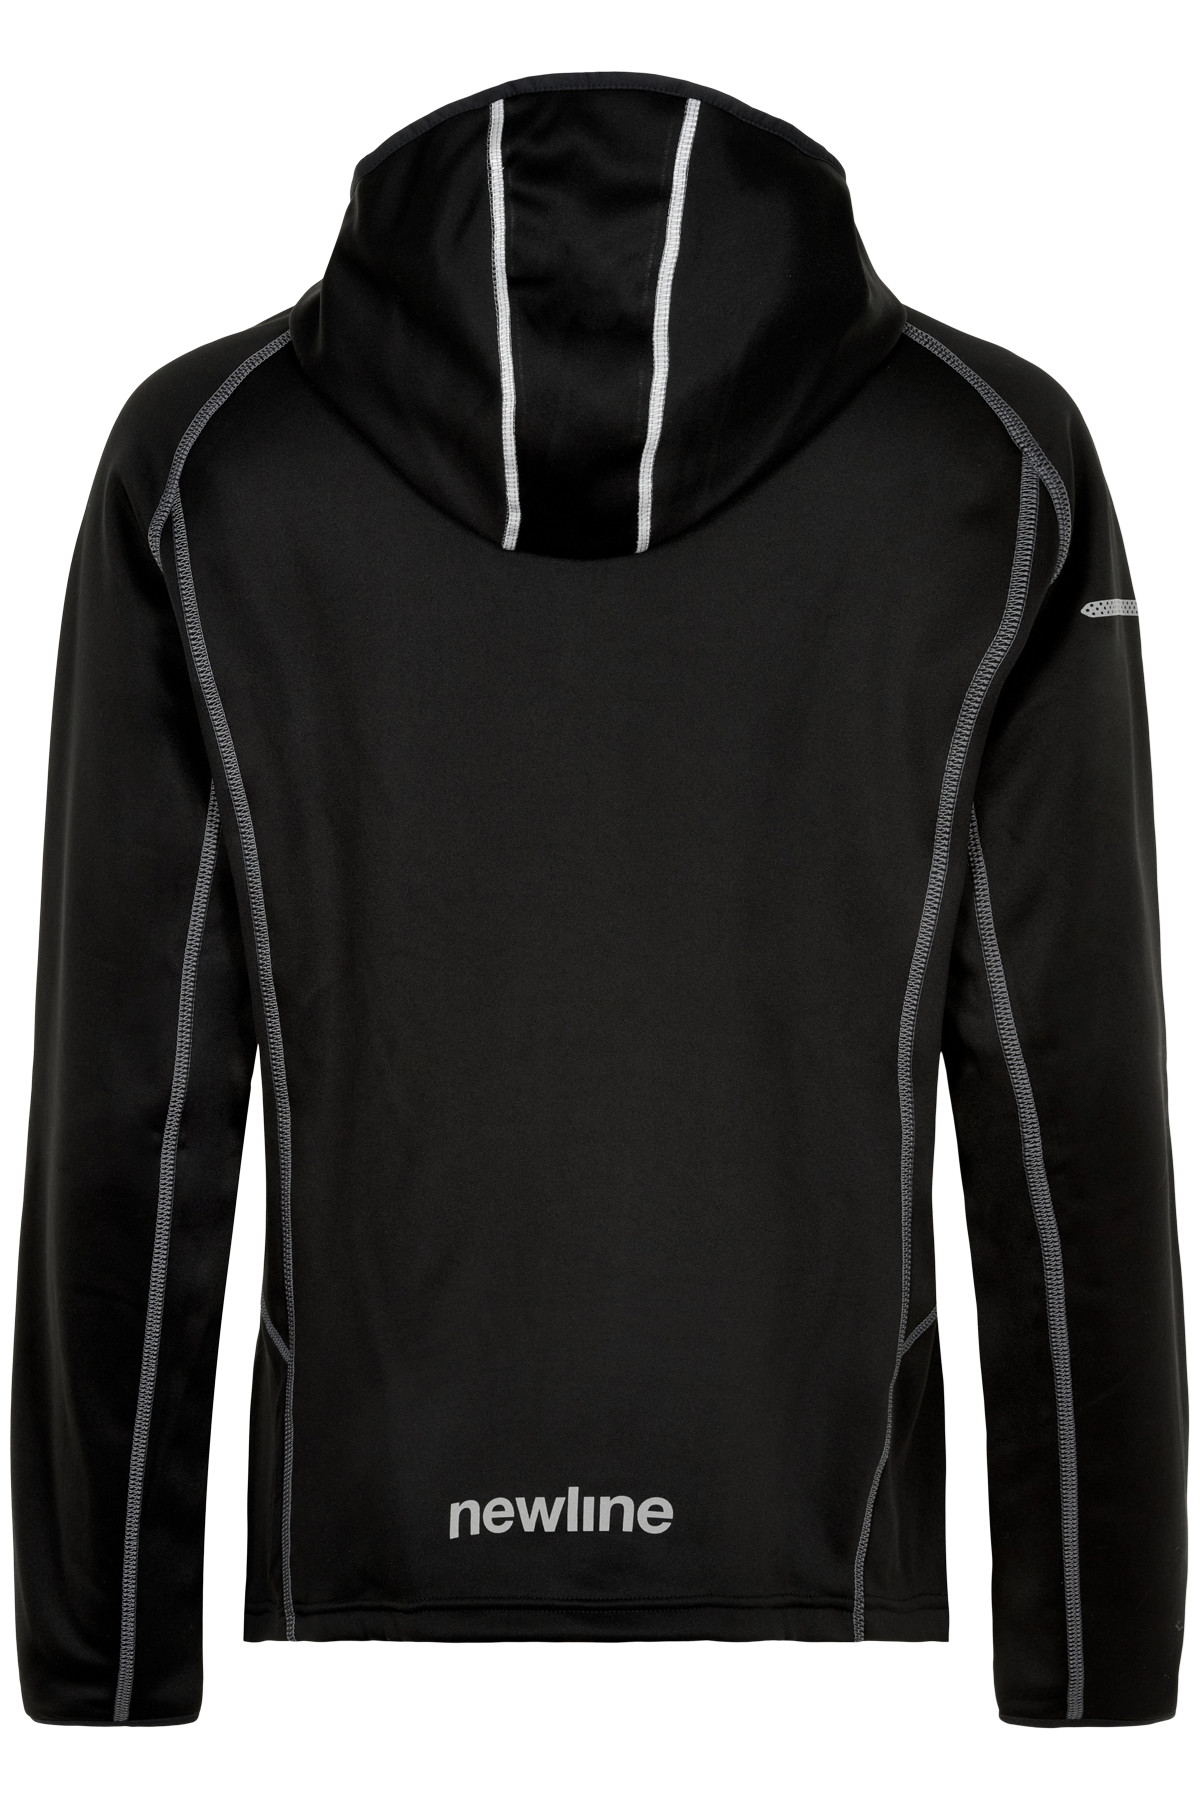 Newline Base Warm Up jakke, black, x-small